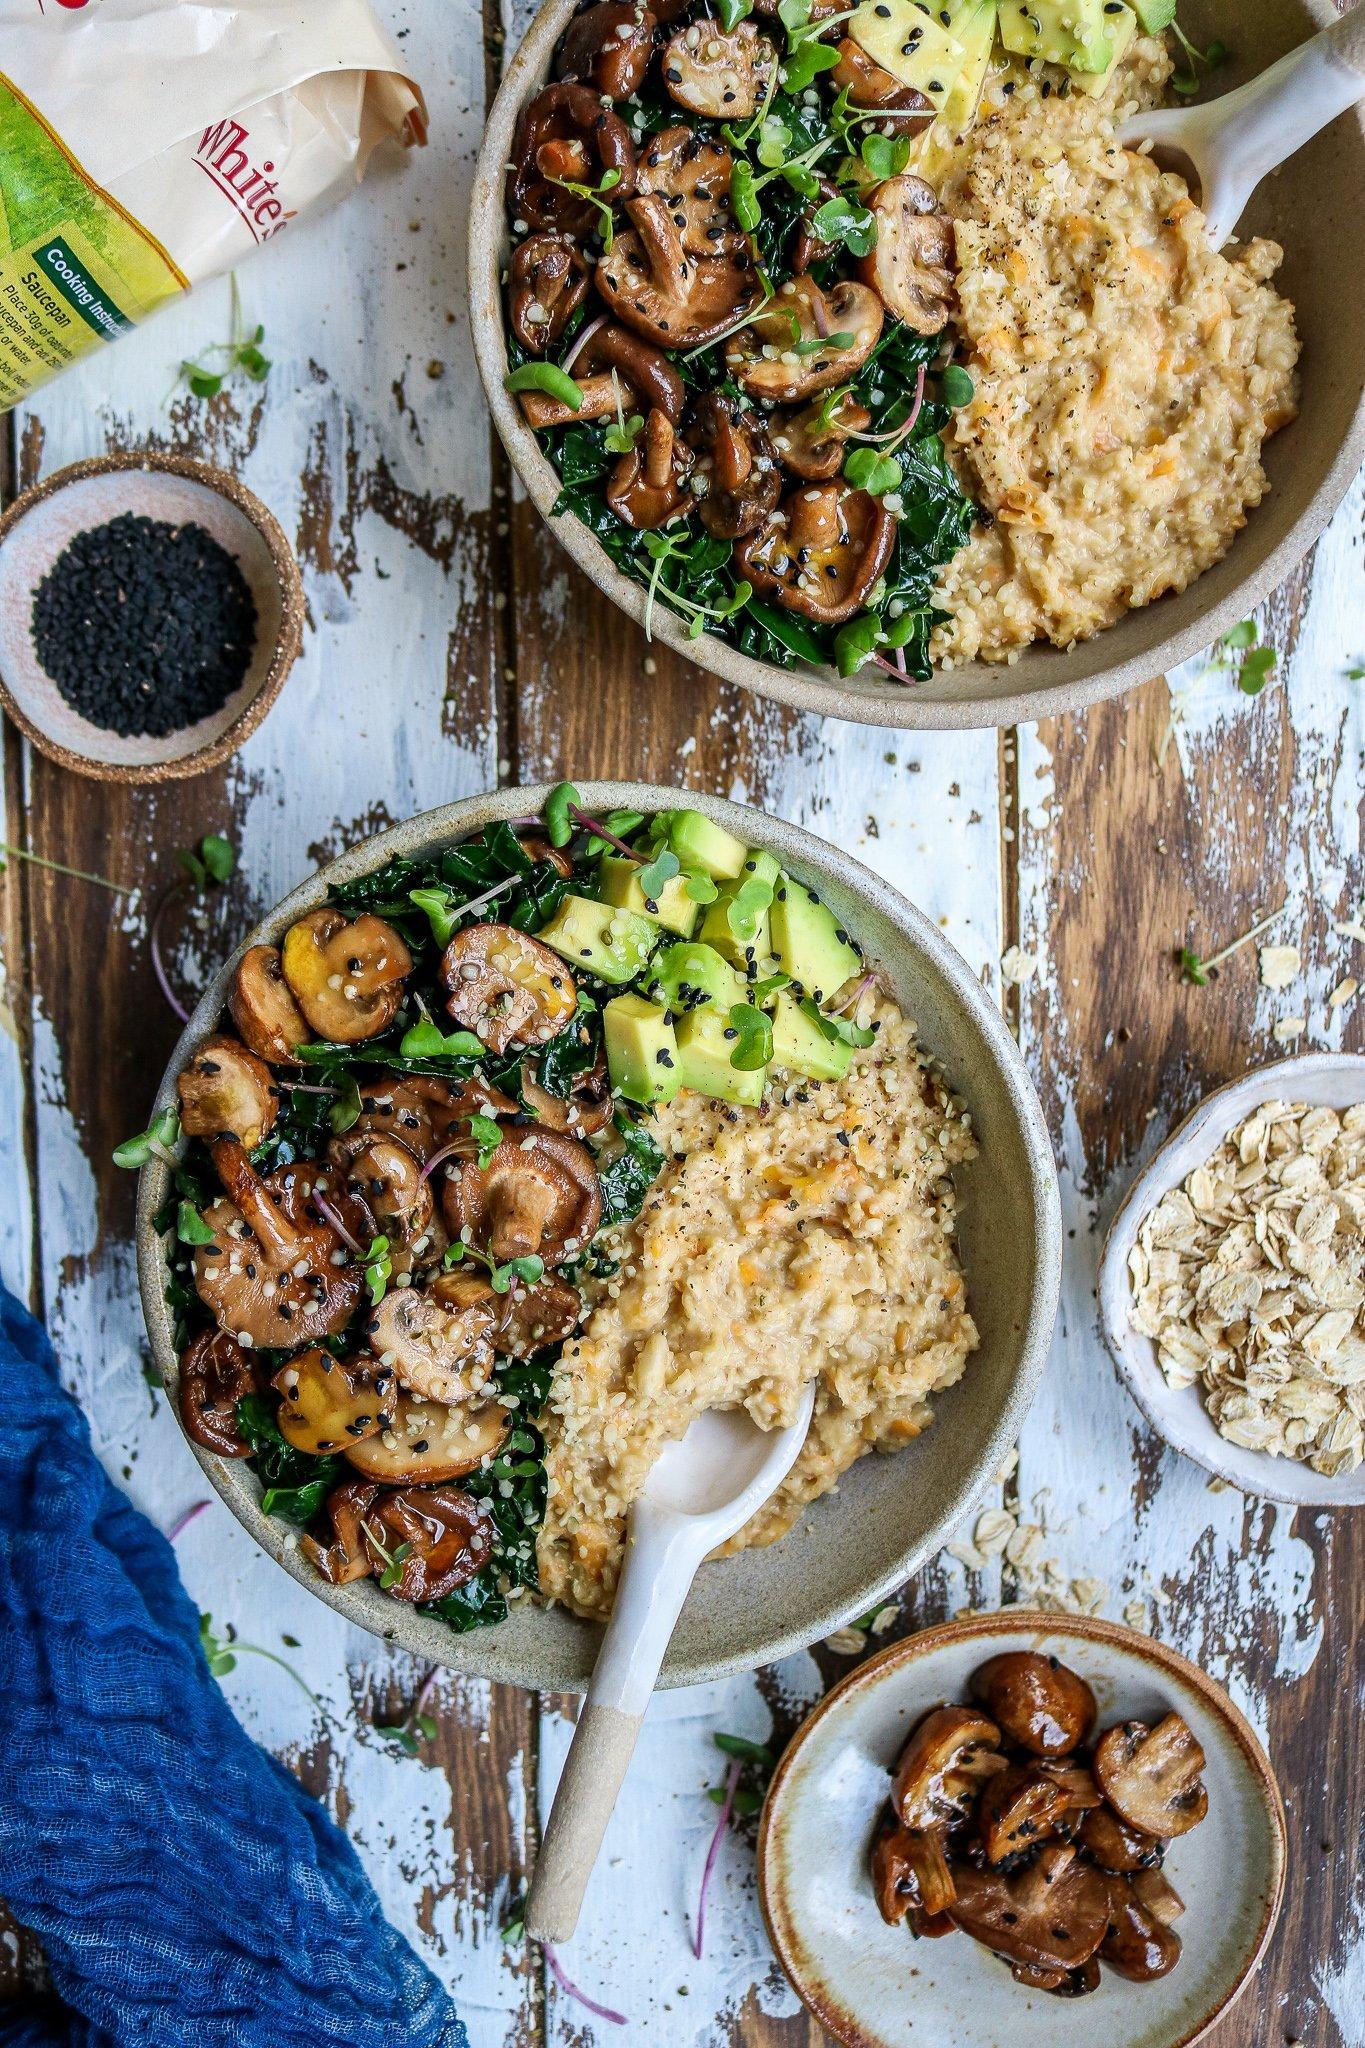 Nourishing Savoury Porridge Bowl with Miso Mushrooms & Kale